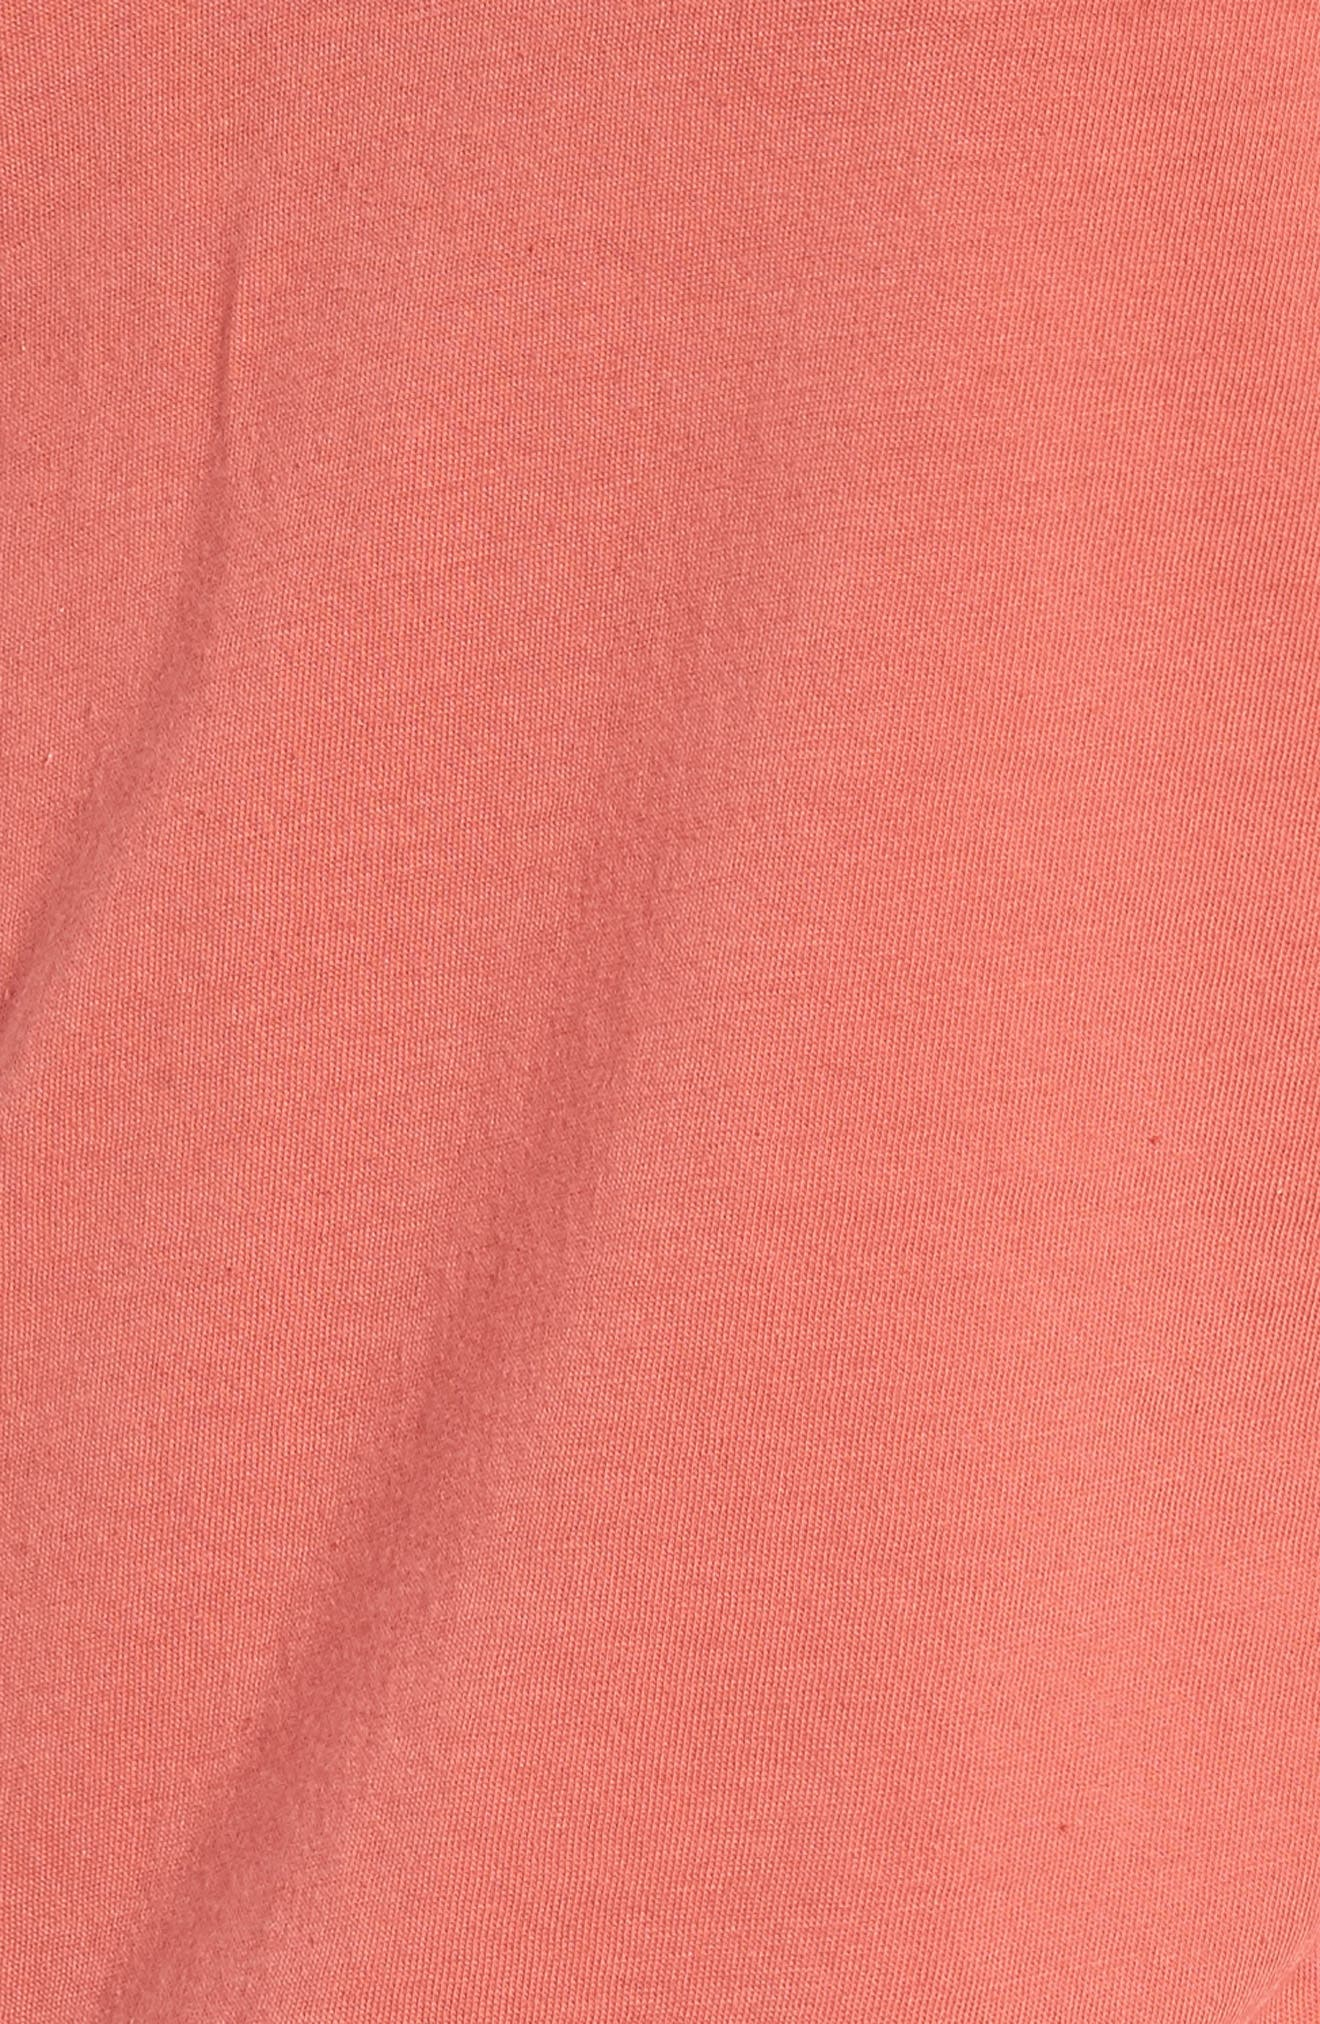 Henson Tee,                             Alternate thumbnail 161, color,